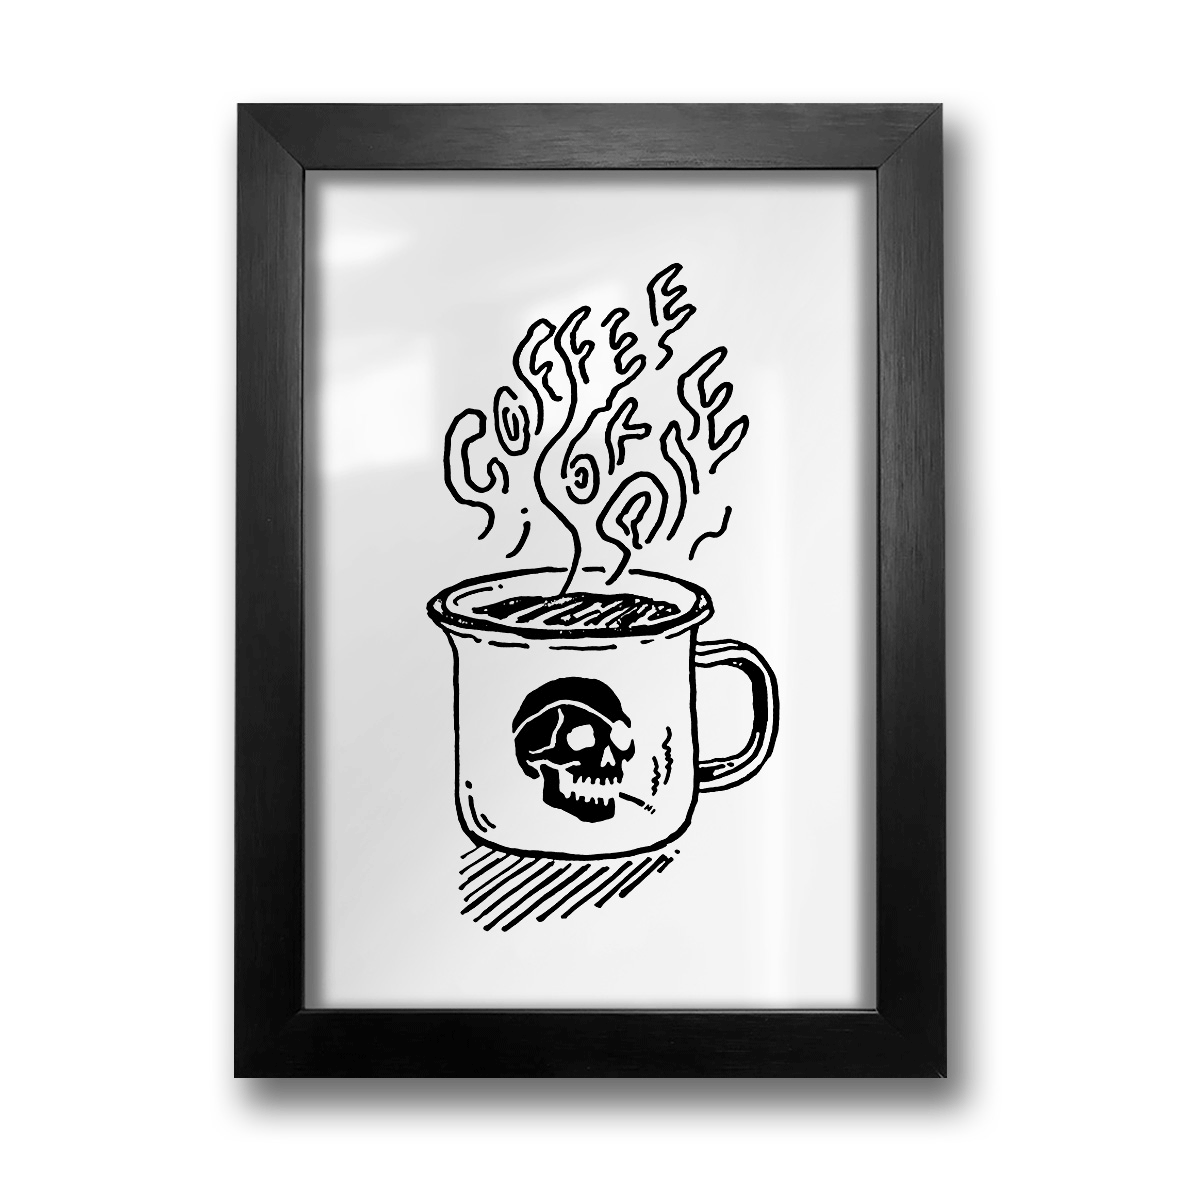 Quadro A4 - Coffee or Die